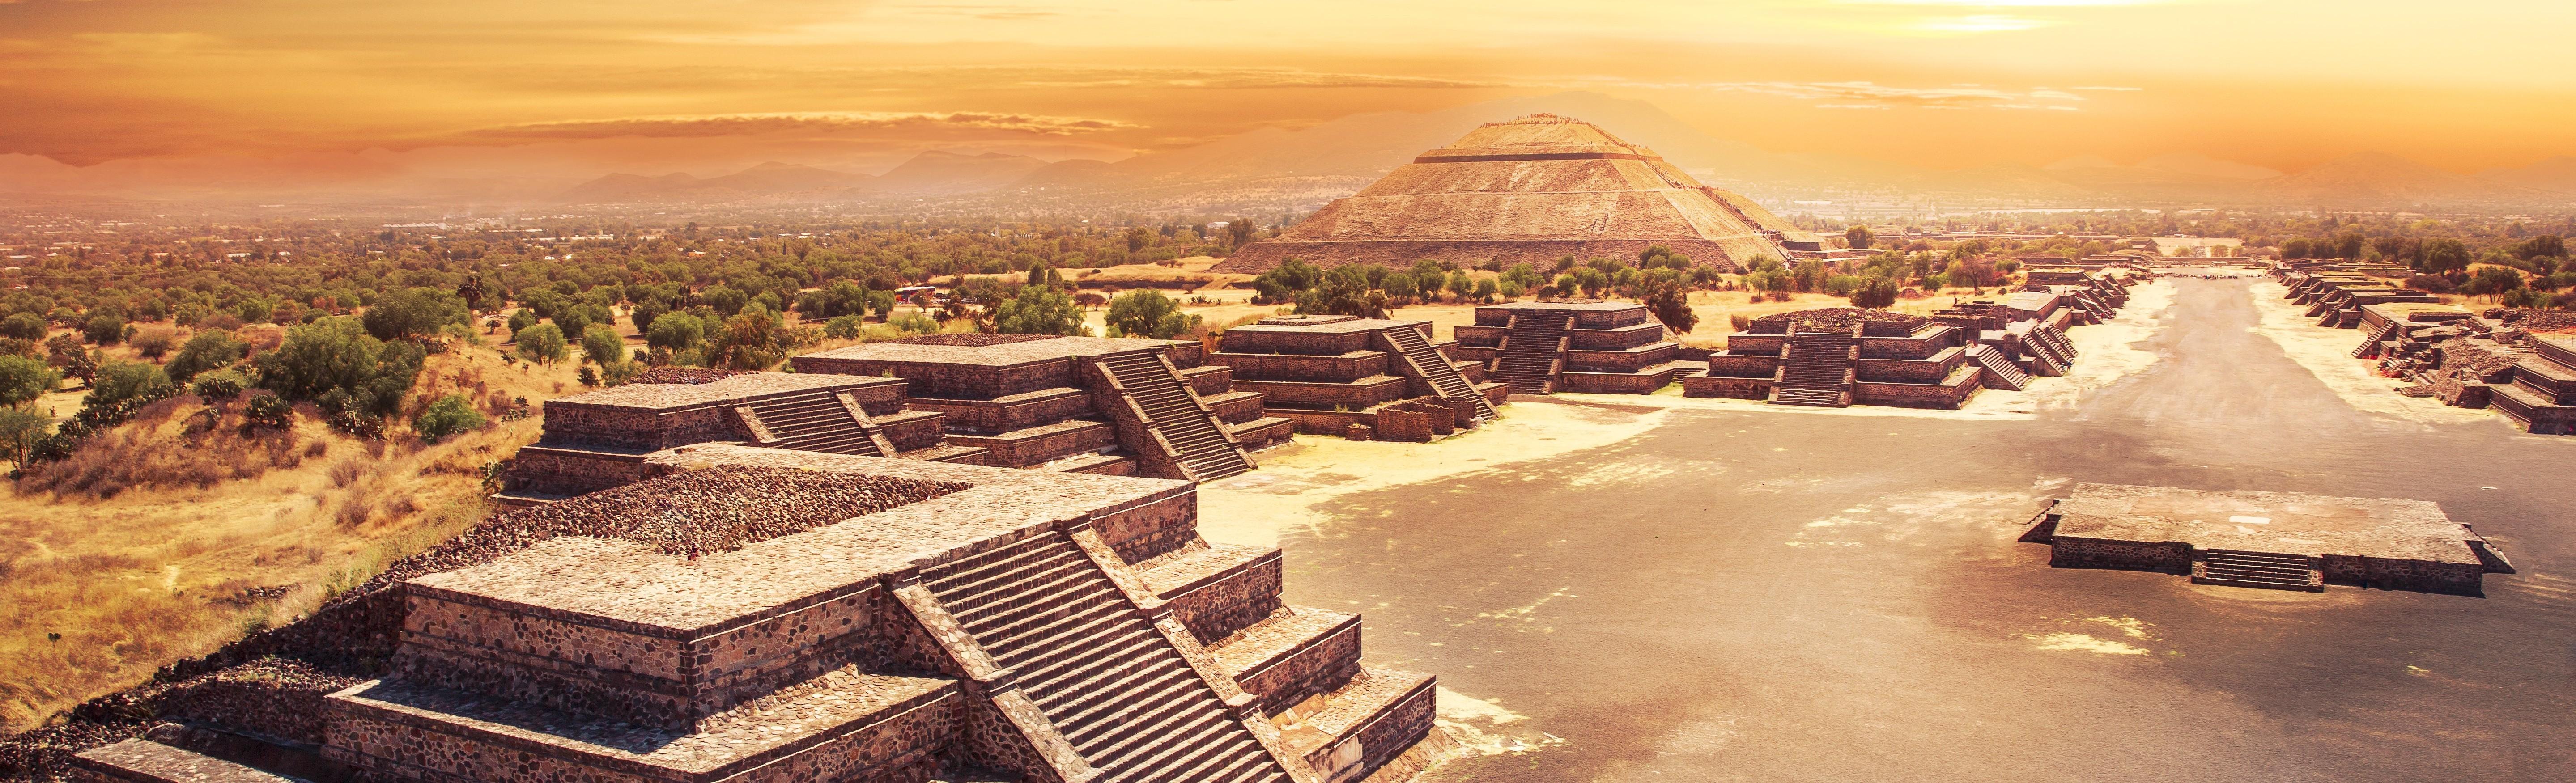 "Sunrise ""Early Access"" Teotihuacan Tour – Full Day - Book Now | TripGuru"